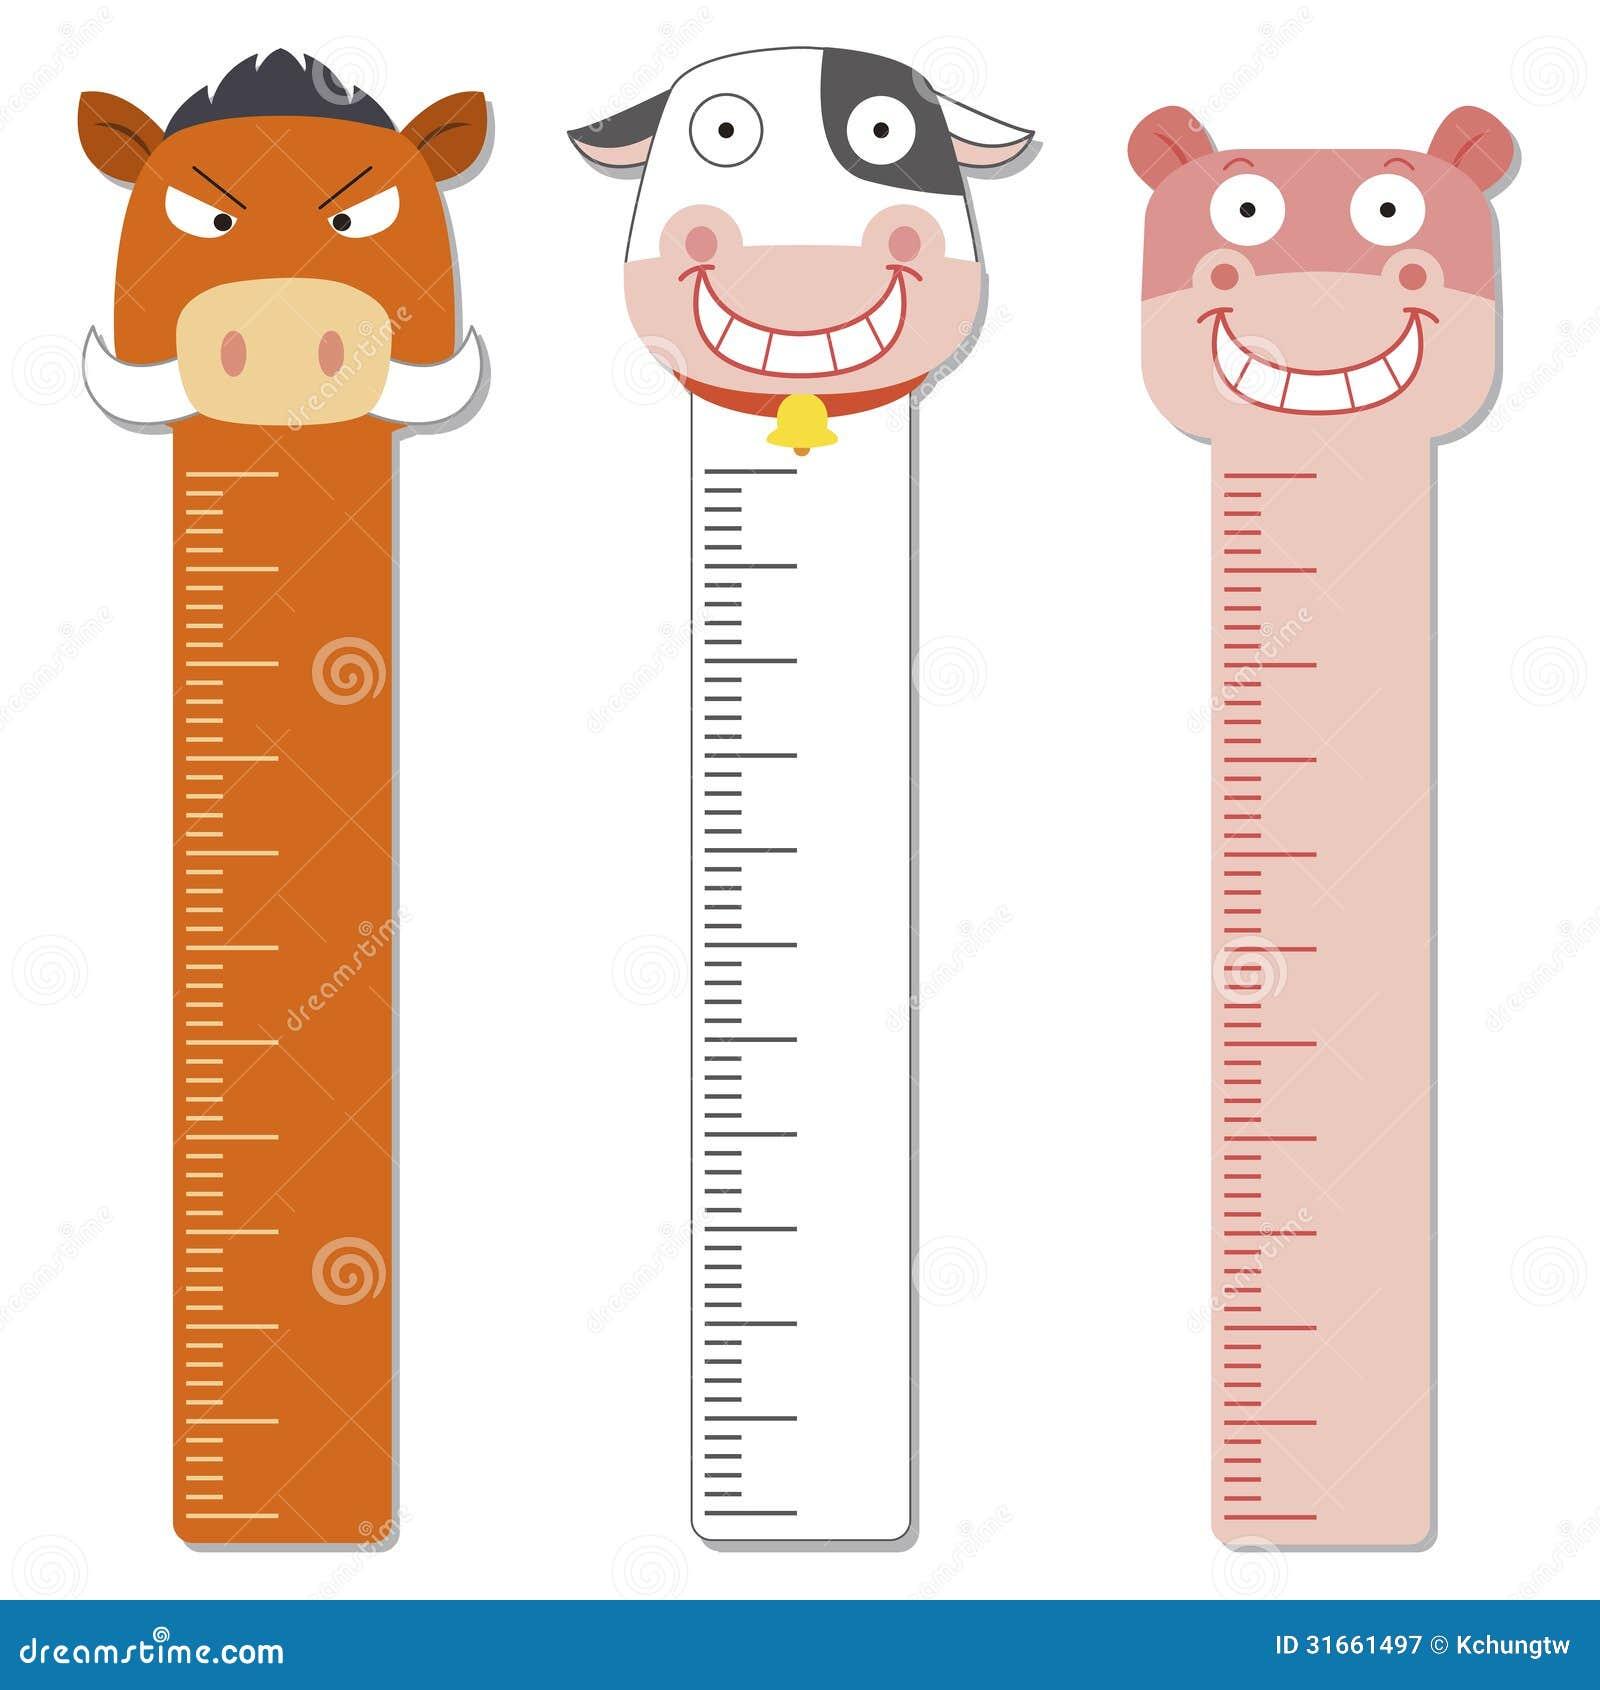 Cute Bumper Children Meter Wall. Stock Vector